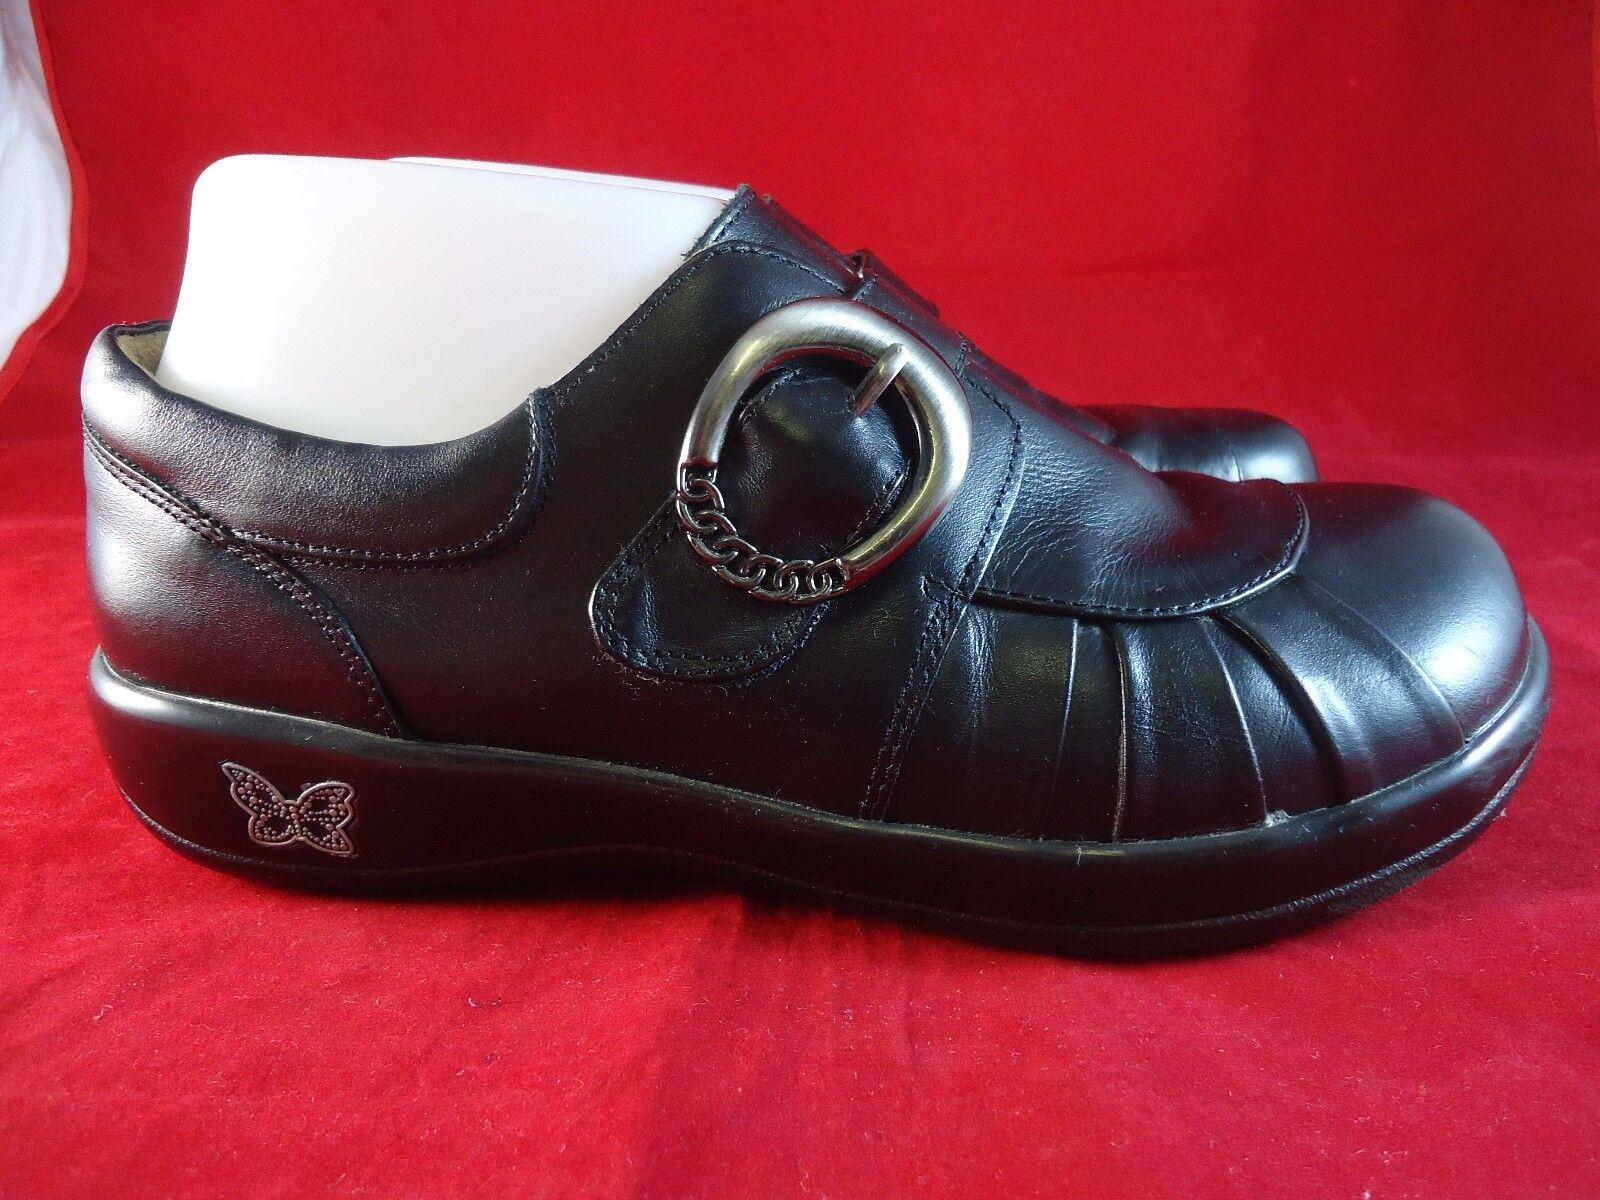 ALEGRIA Par PG LITE Khloe femmes noir Cuir Mocassins chaussures Sz US 6.5-7 EU 37